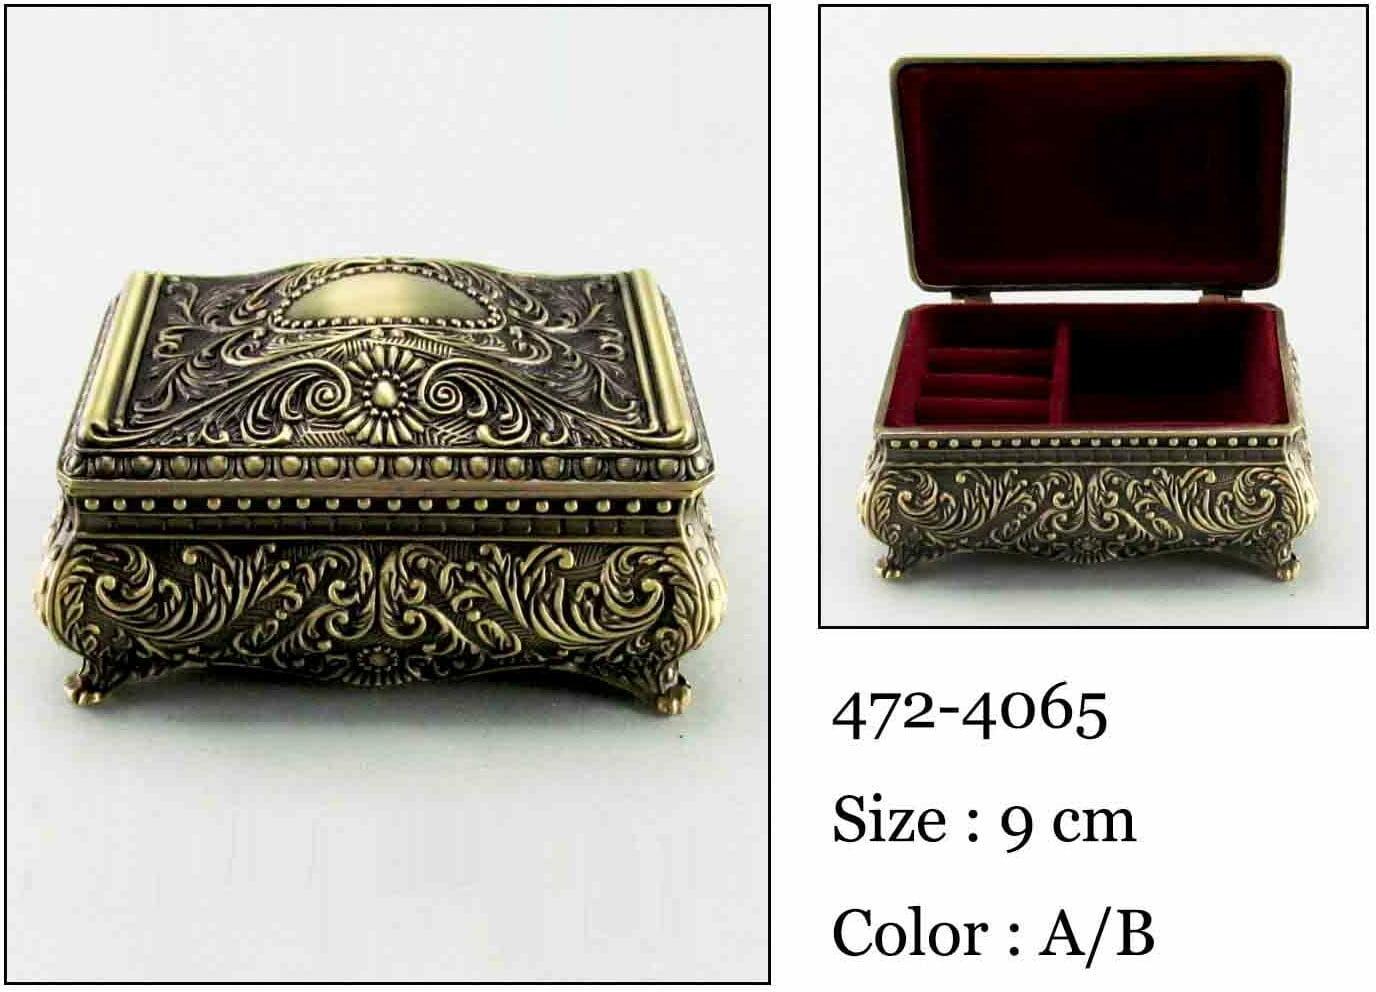 Kasetka, stare złoto, 8,5x5,5 cm